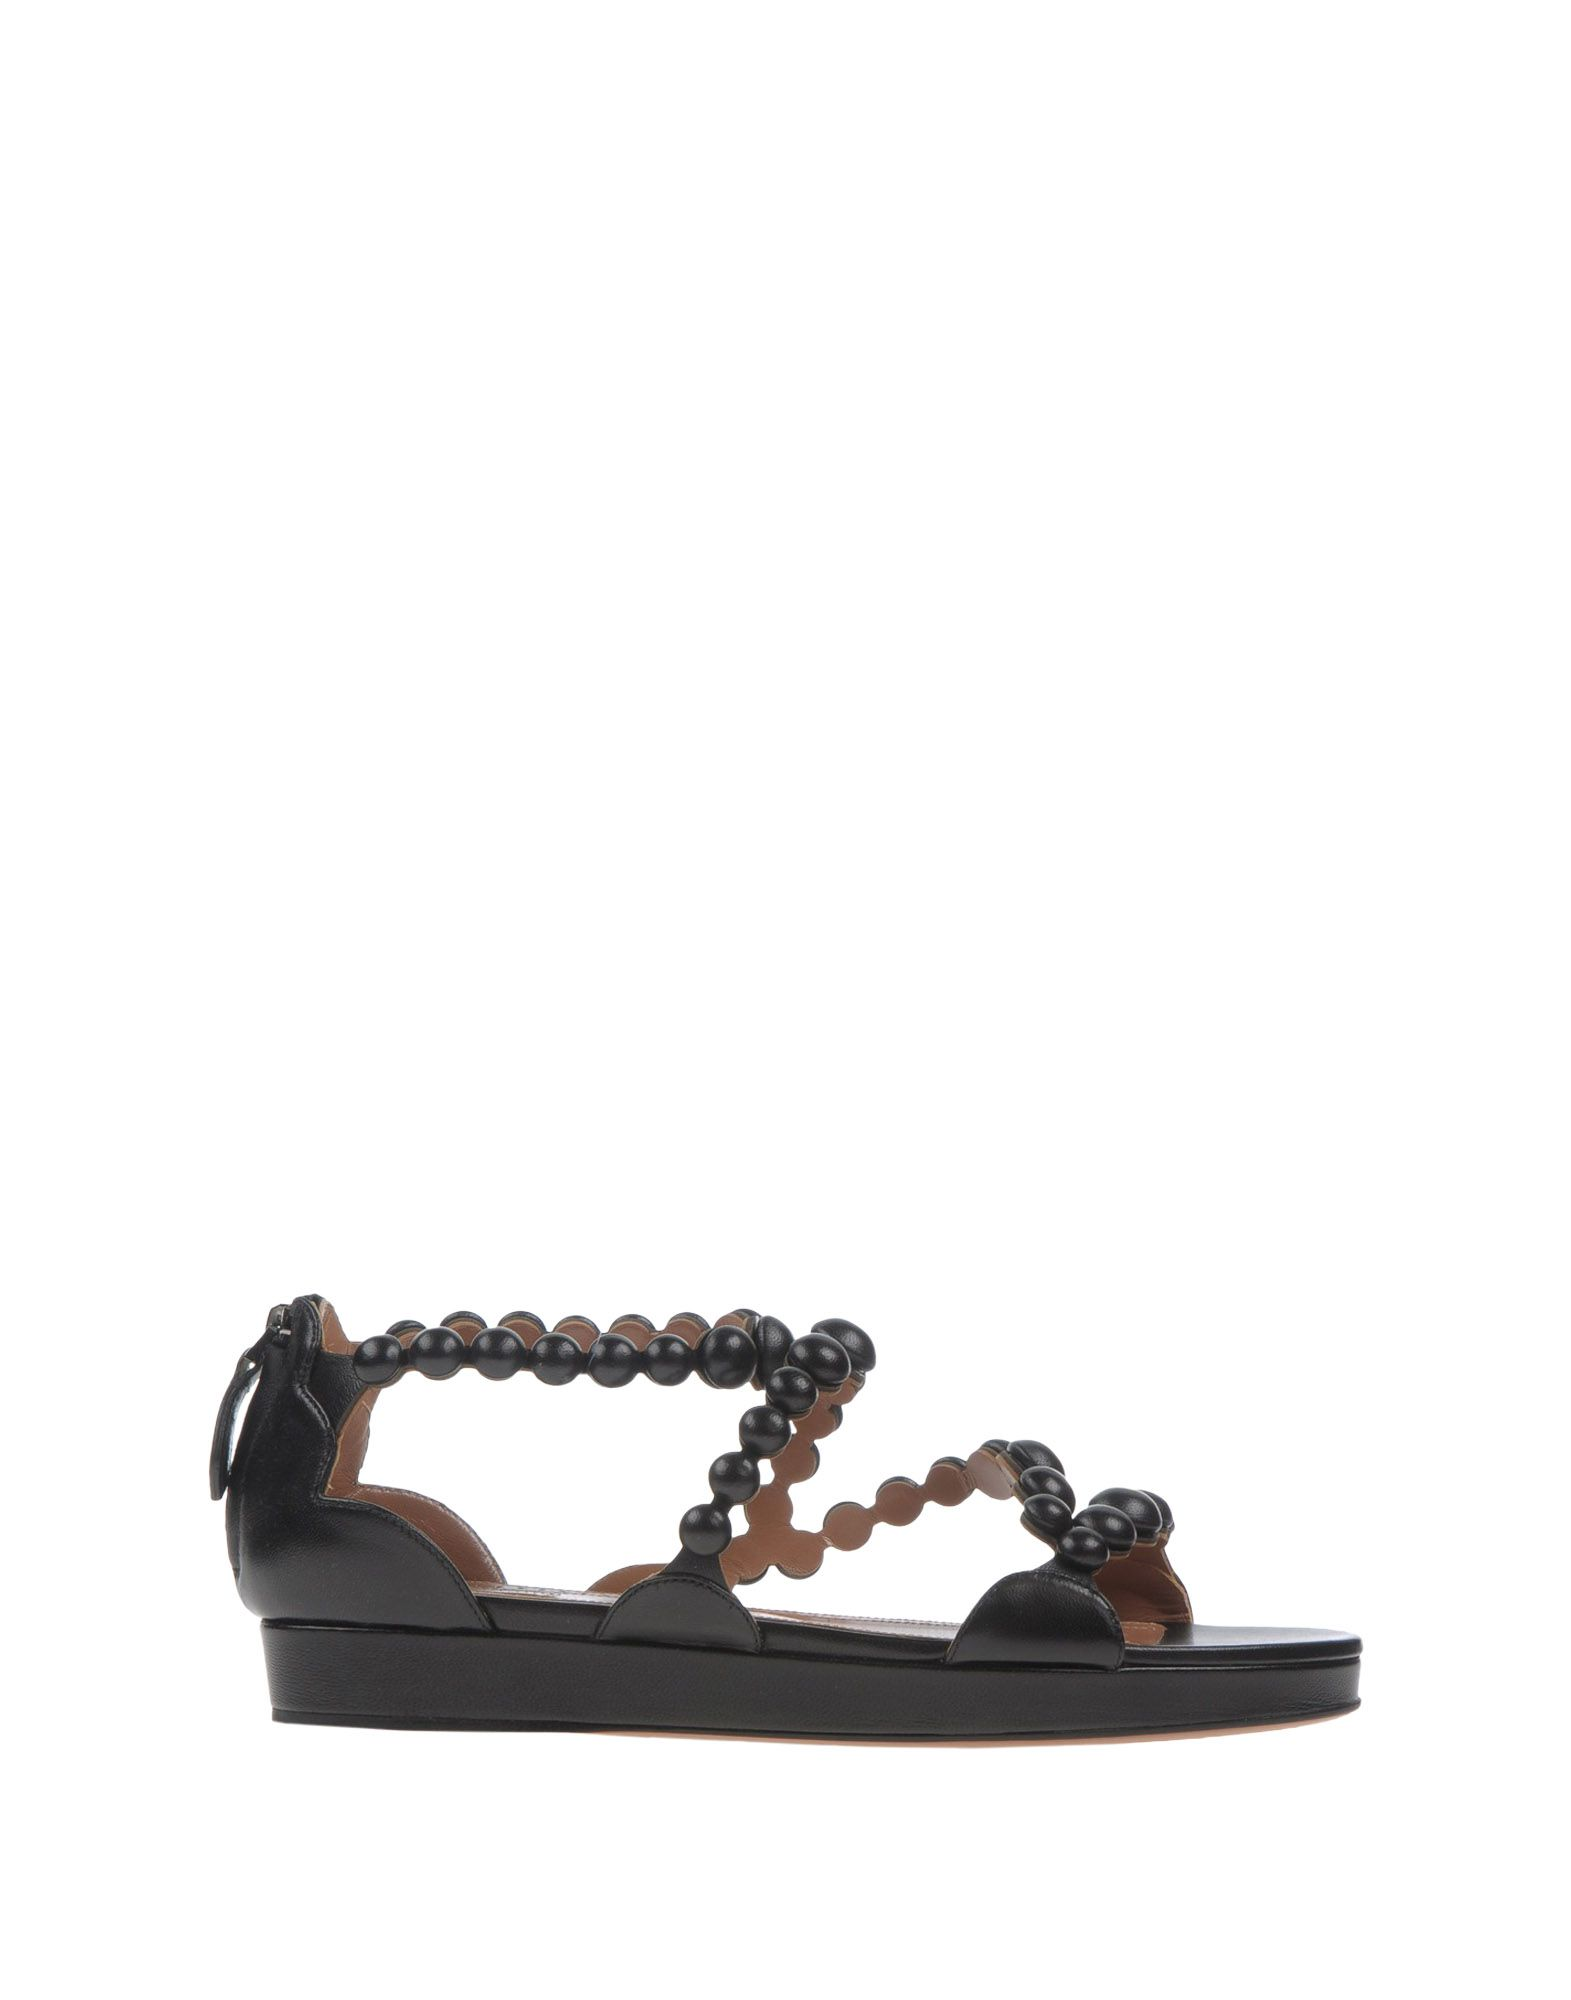 Schuhe Alaïa Sandalen Damen  11356585IF Heiße Schuhe  8cb603